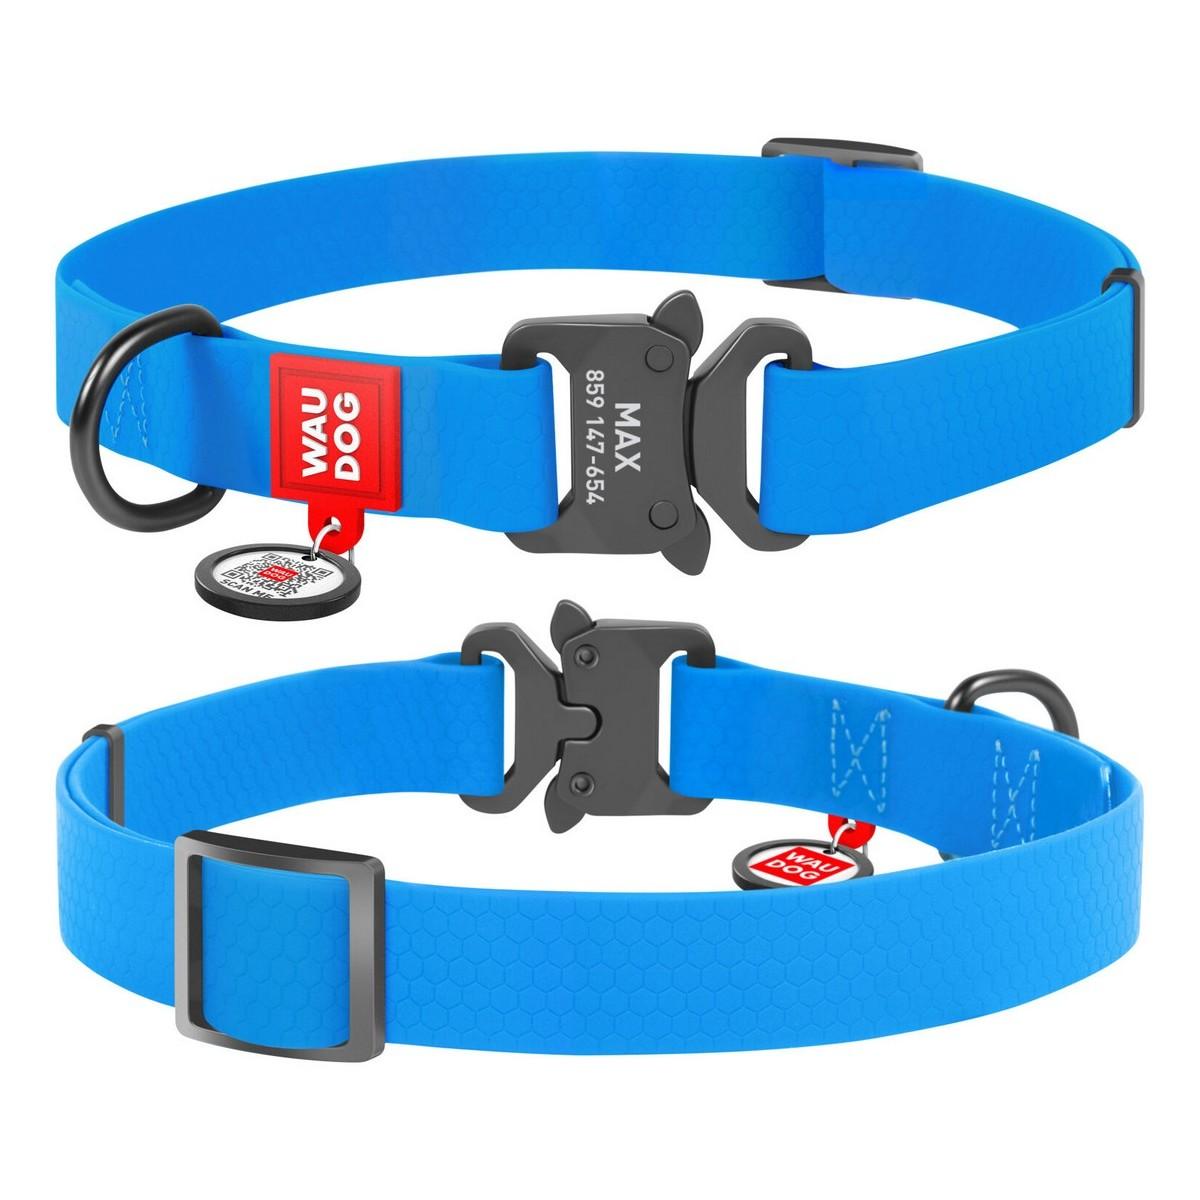 Нашийник для собак водостійкий WAUDOG Waterproof, металева пряжка-фастекс, блакитний